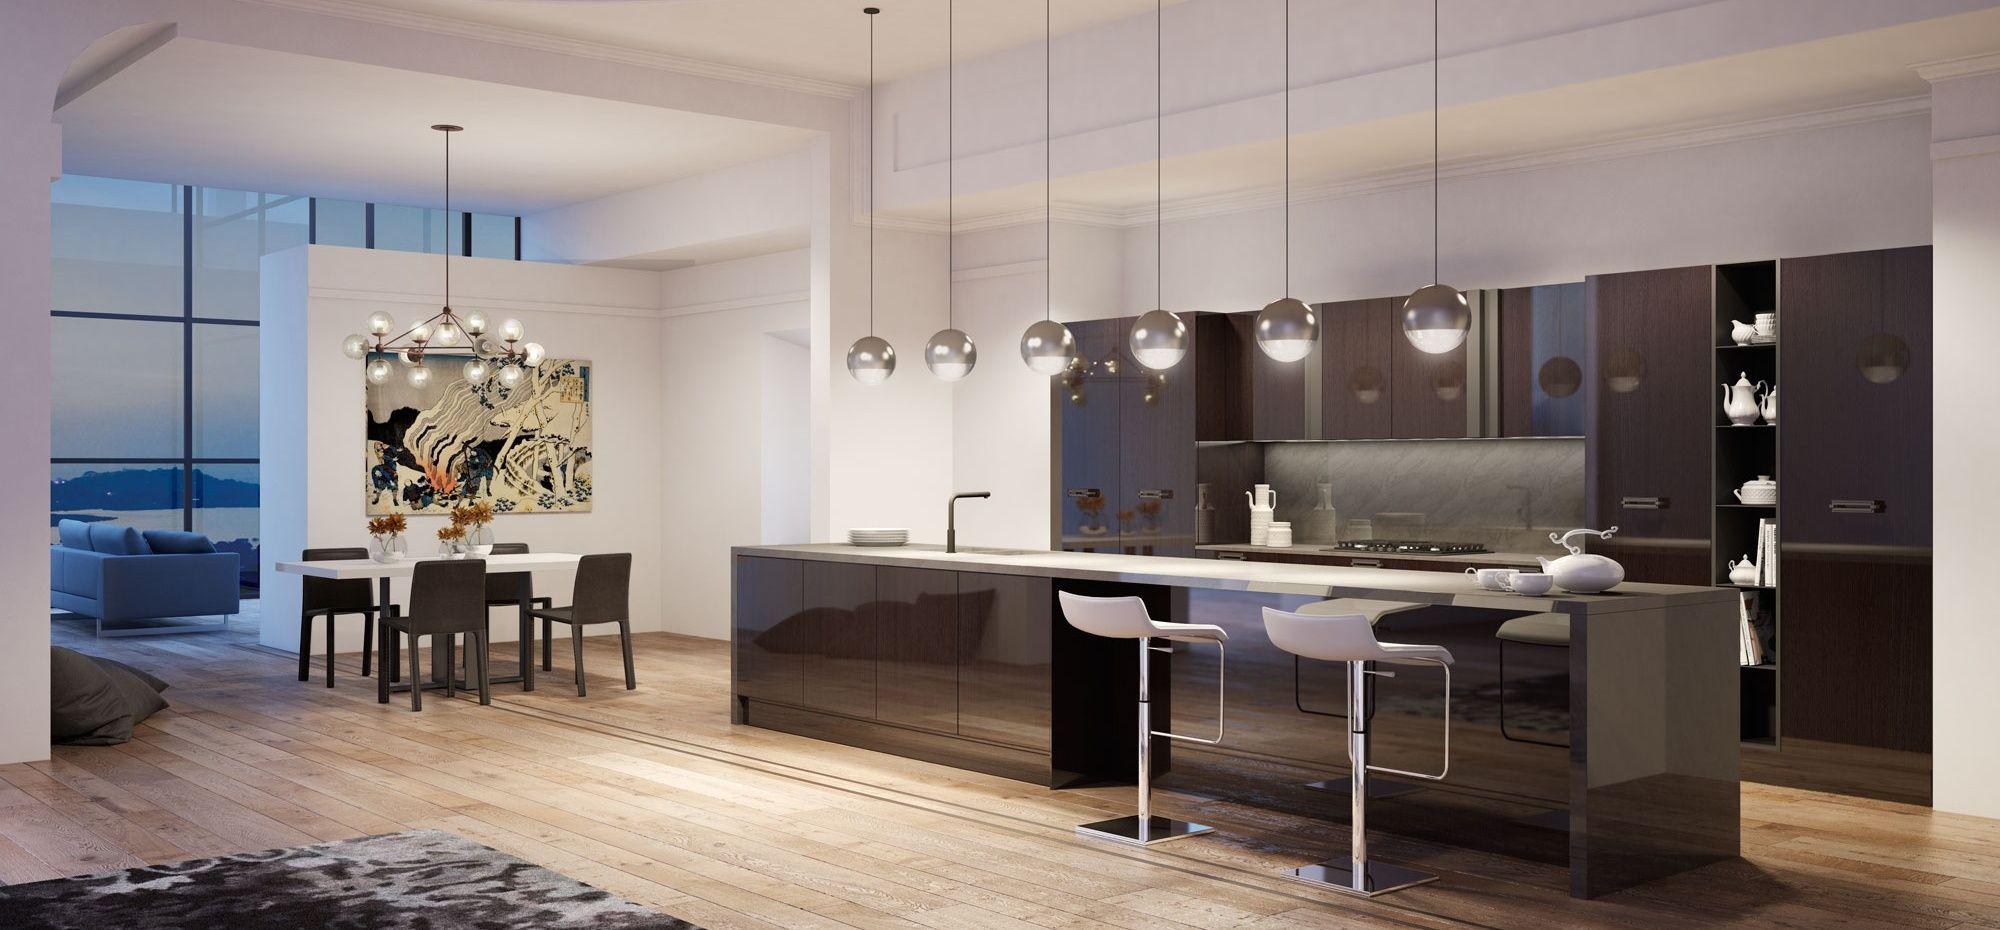 Soho • Cucine moderne by Berloni | Кухни | Pinterest | Modern ...